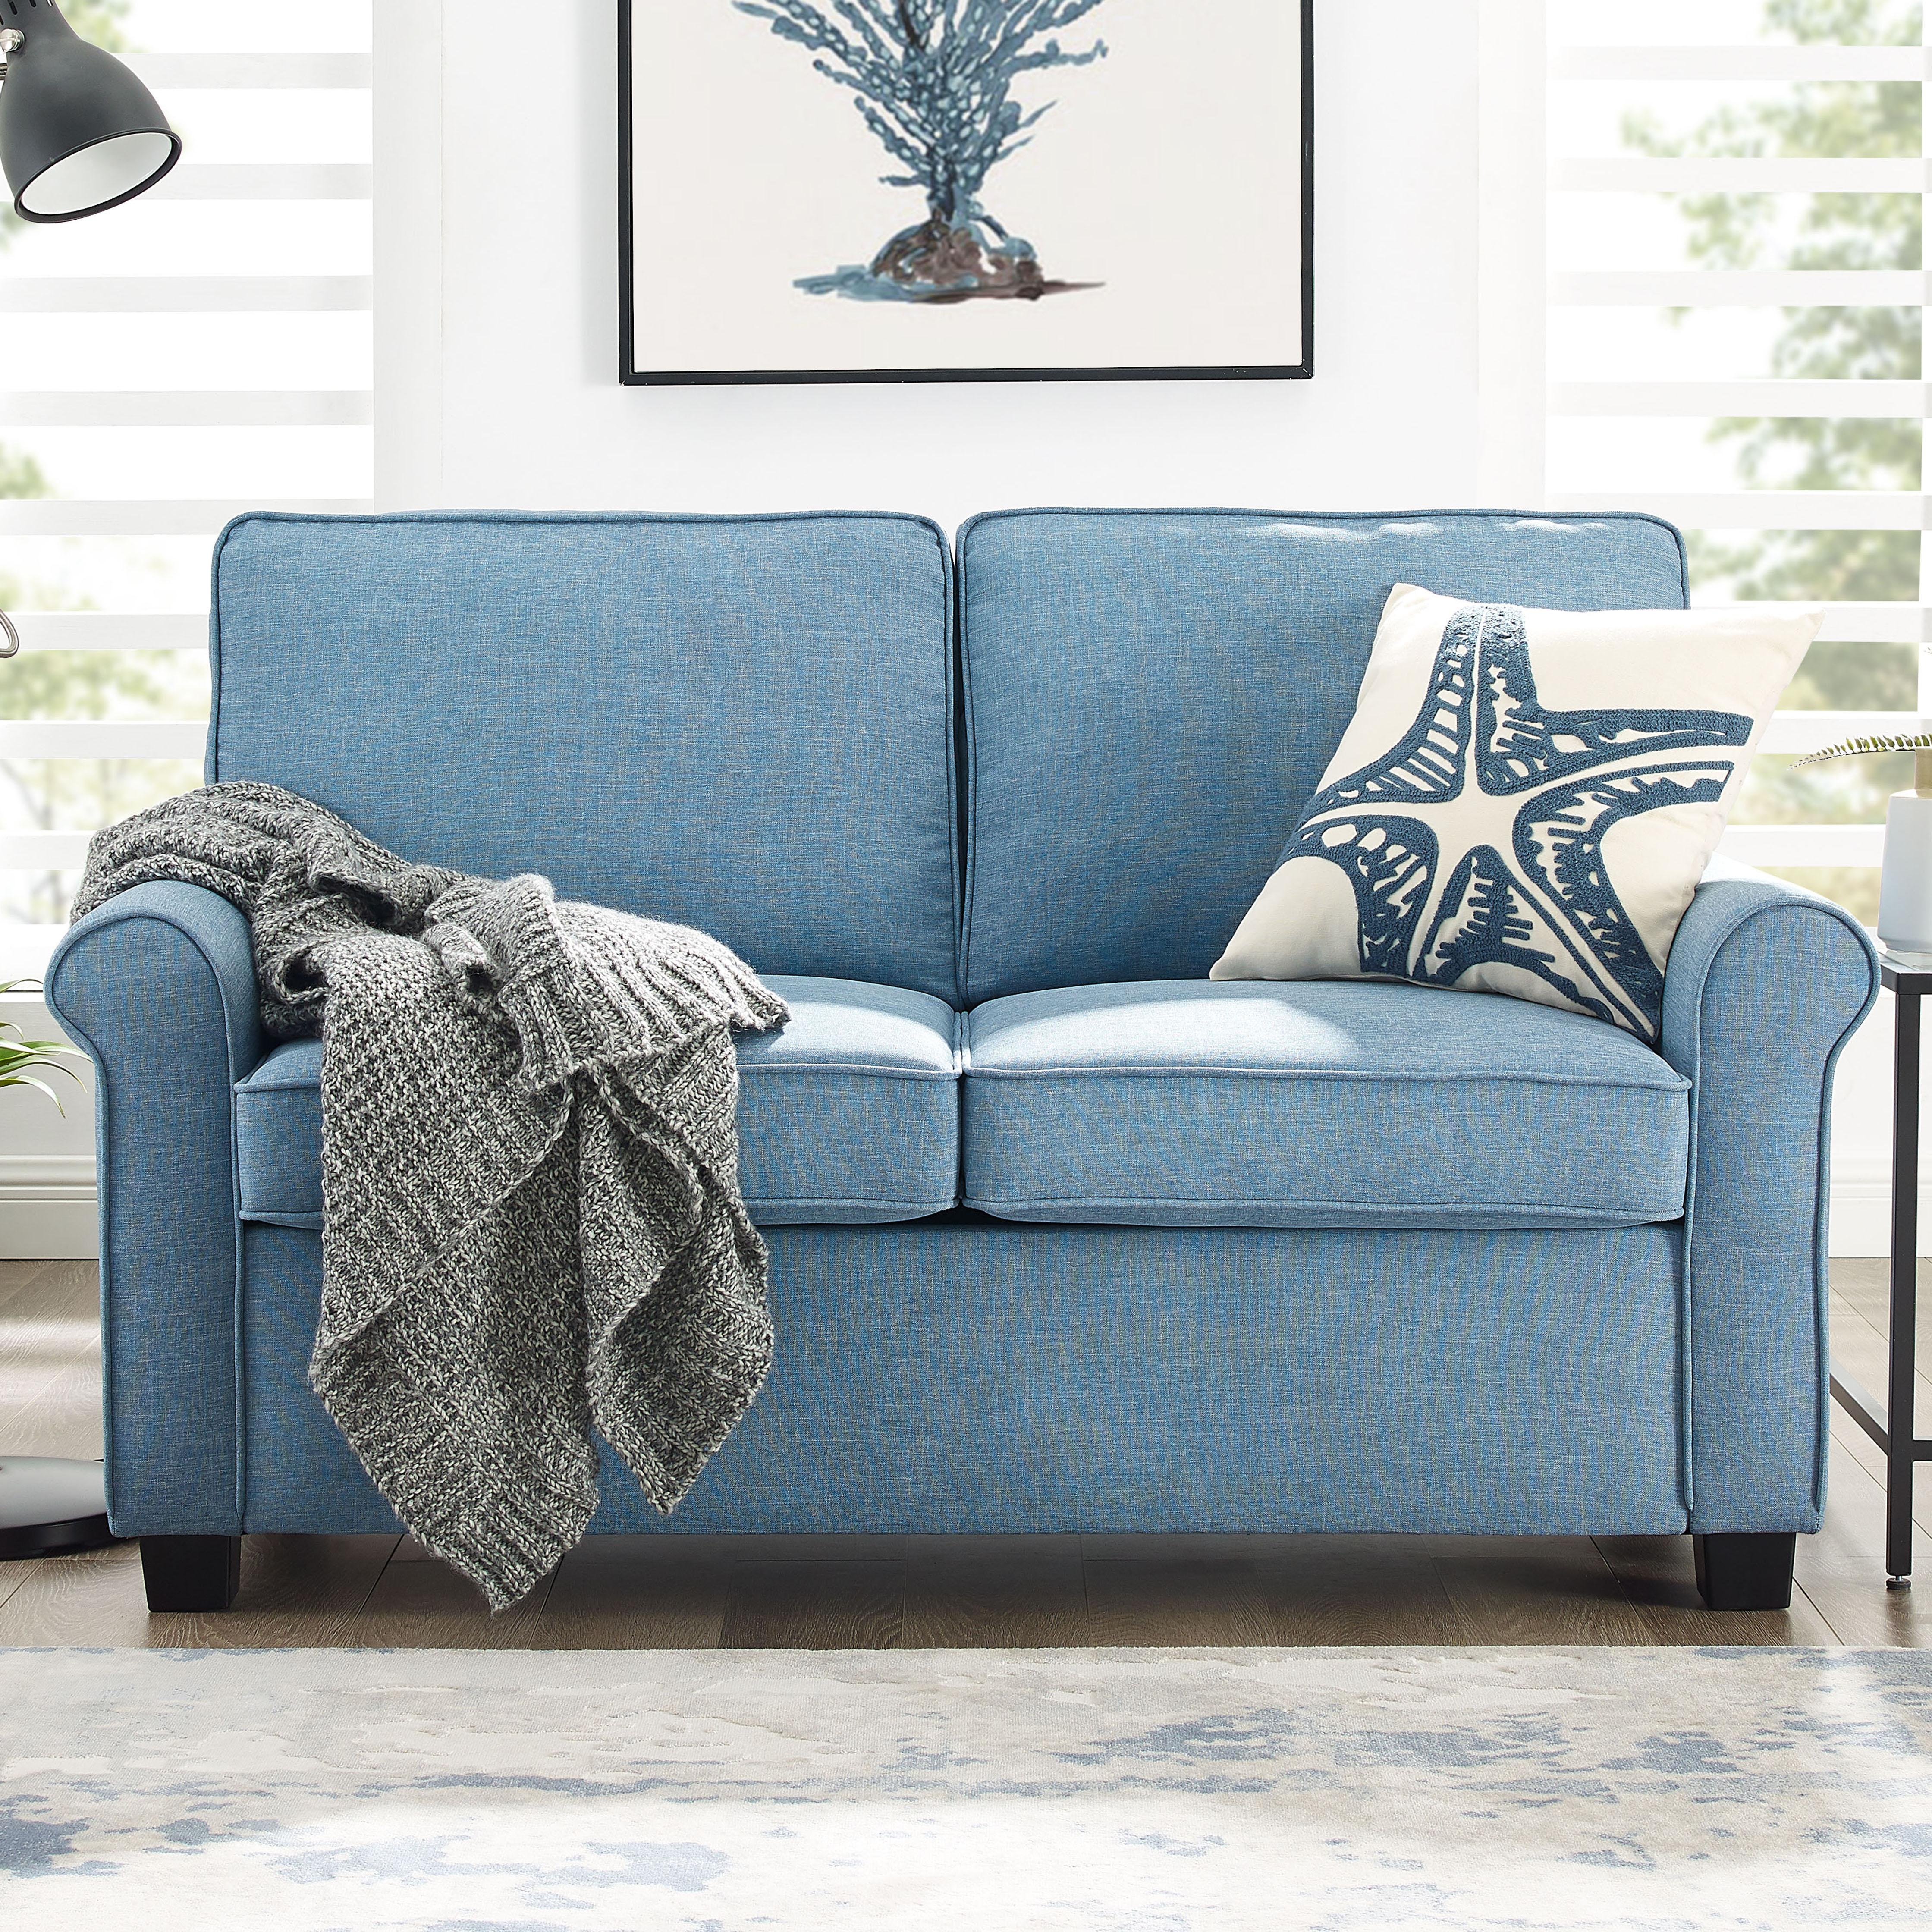 Mainstays Traditional Loveseat Sleeper with Memory Foam Mattress (Blue, Black, Burgundy, Gray) $329 + Free Shipping